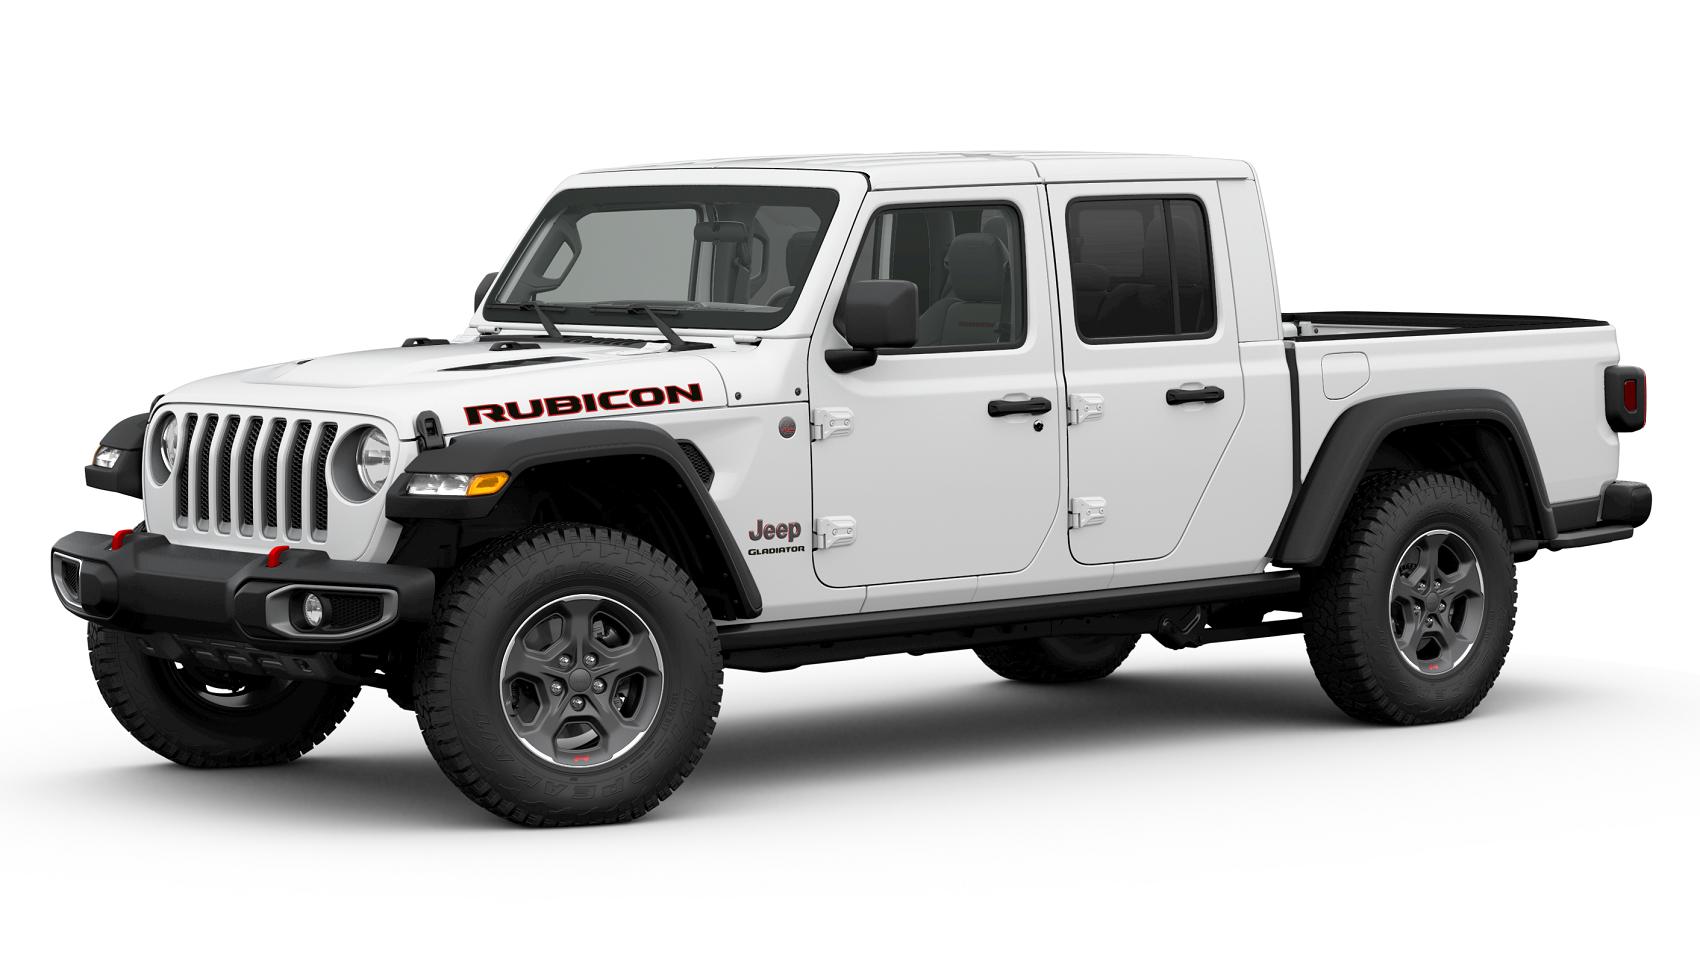 2020 Jeep Gladiator White Exterior